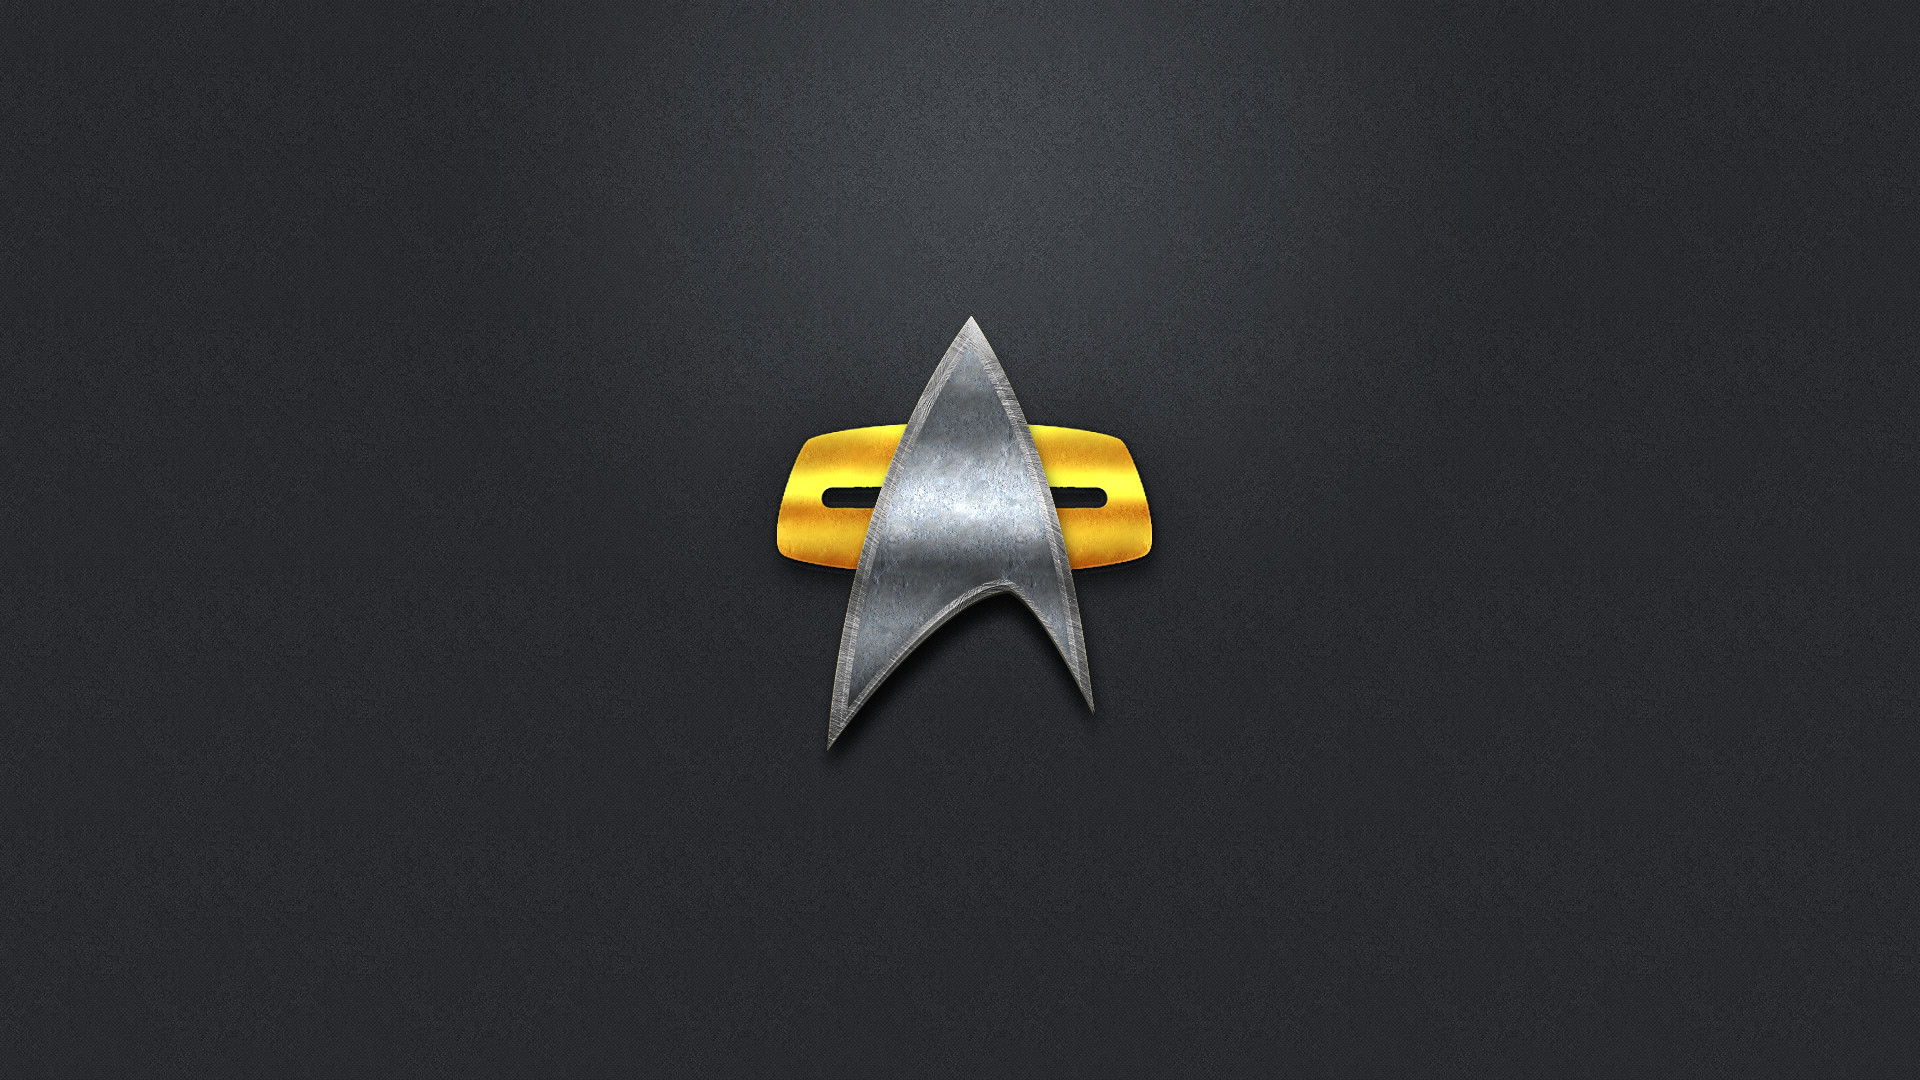 … Star Trek 2370's Com badge Wallpaper by berianlowe